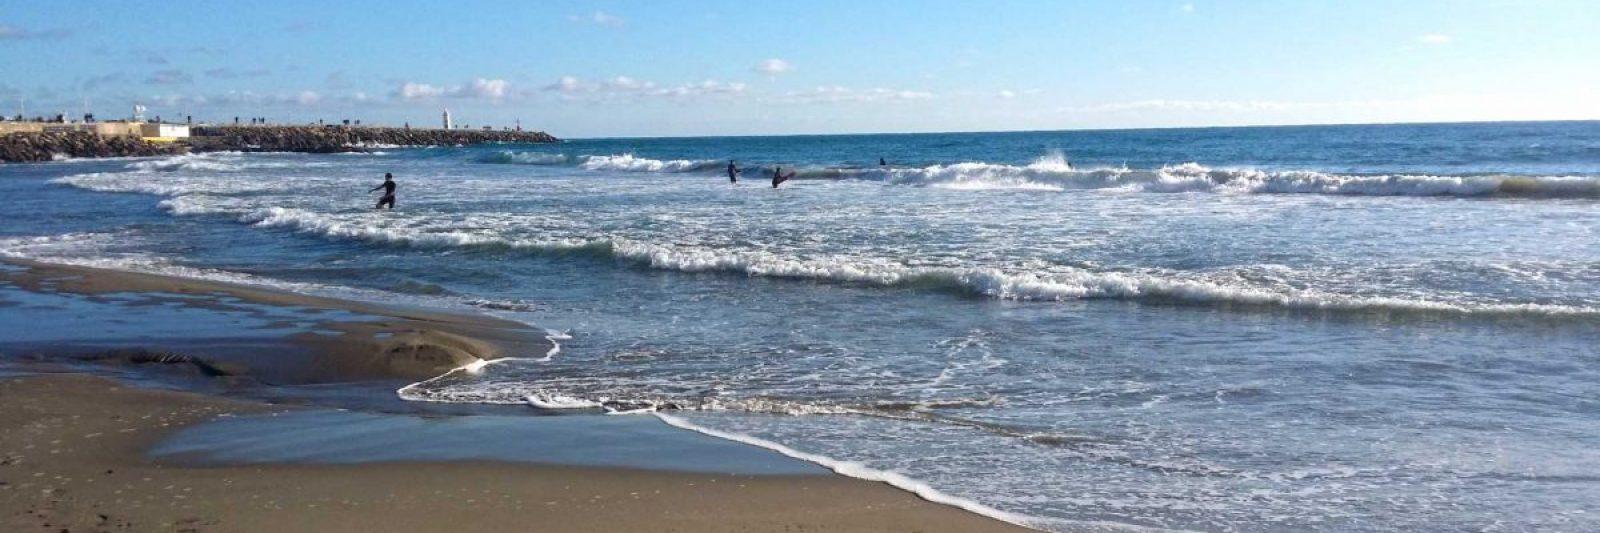 Am Strand von Porto Maurizio